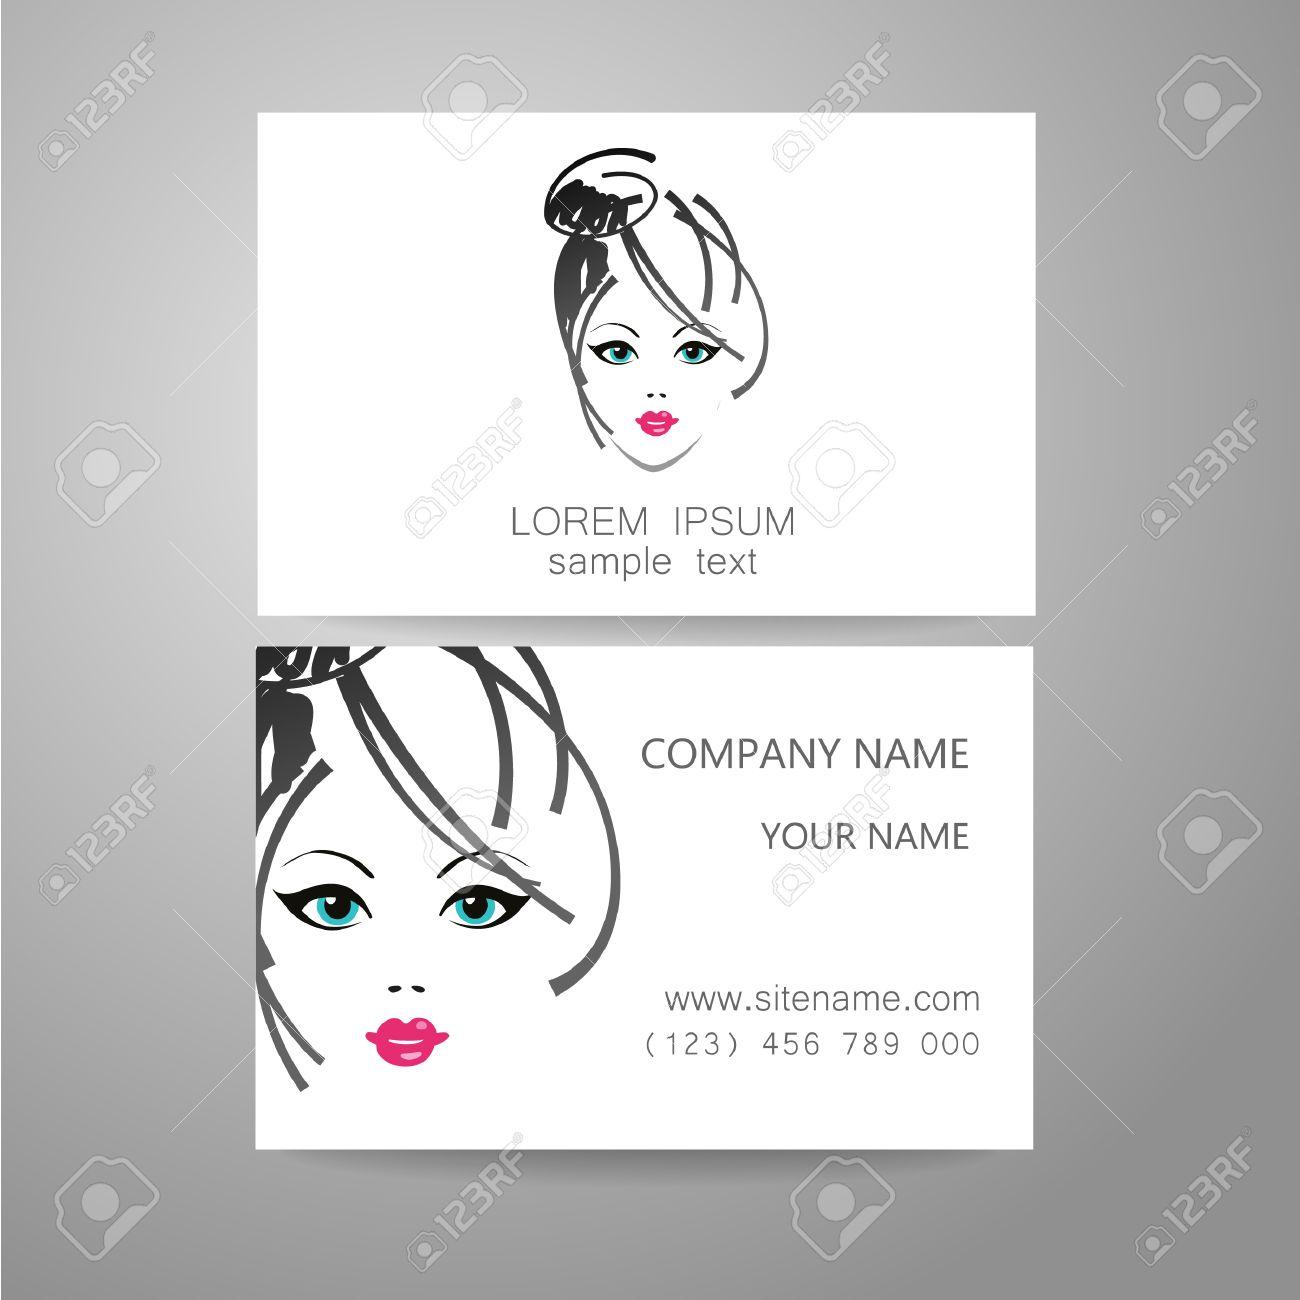 Hair Salon, Hairdresser - Template Logo. Branded Business Card ...